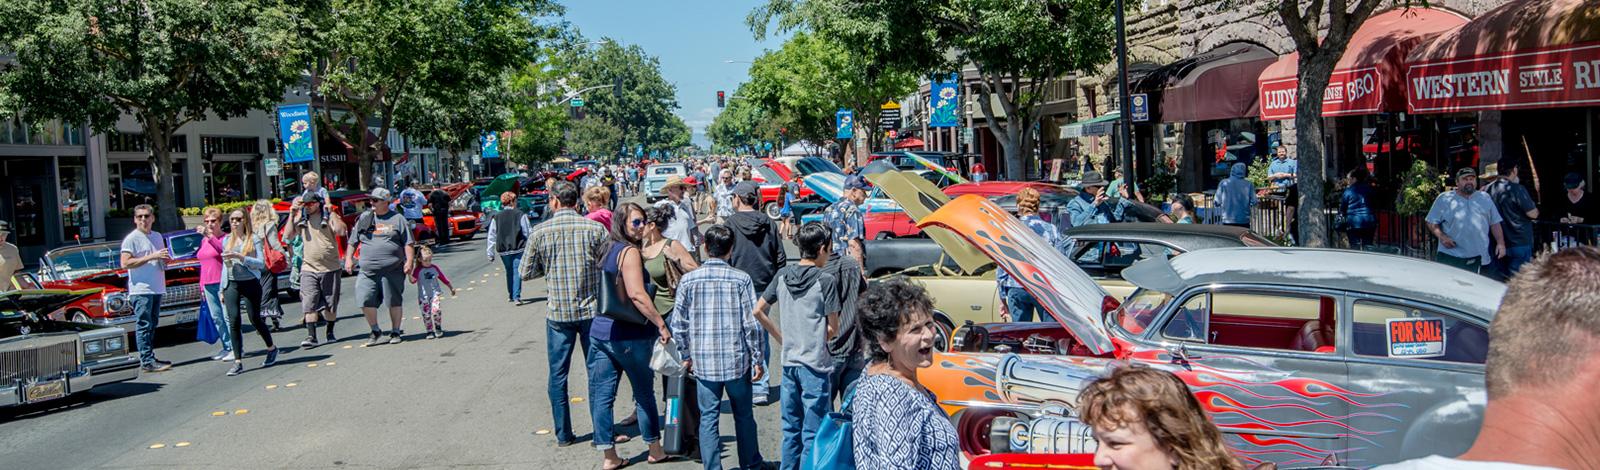 Downtown Woodland Car Show